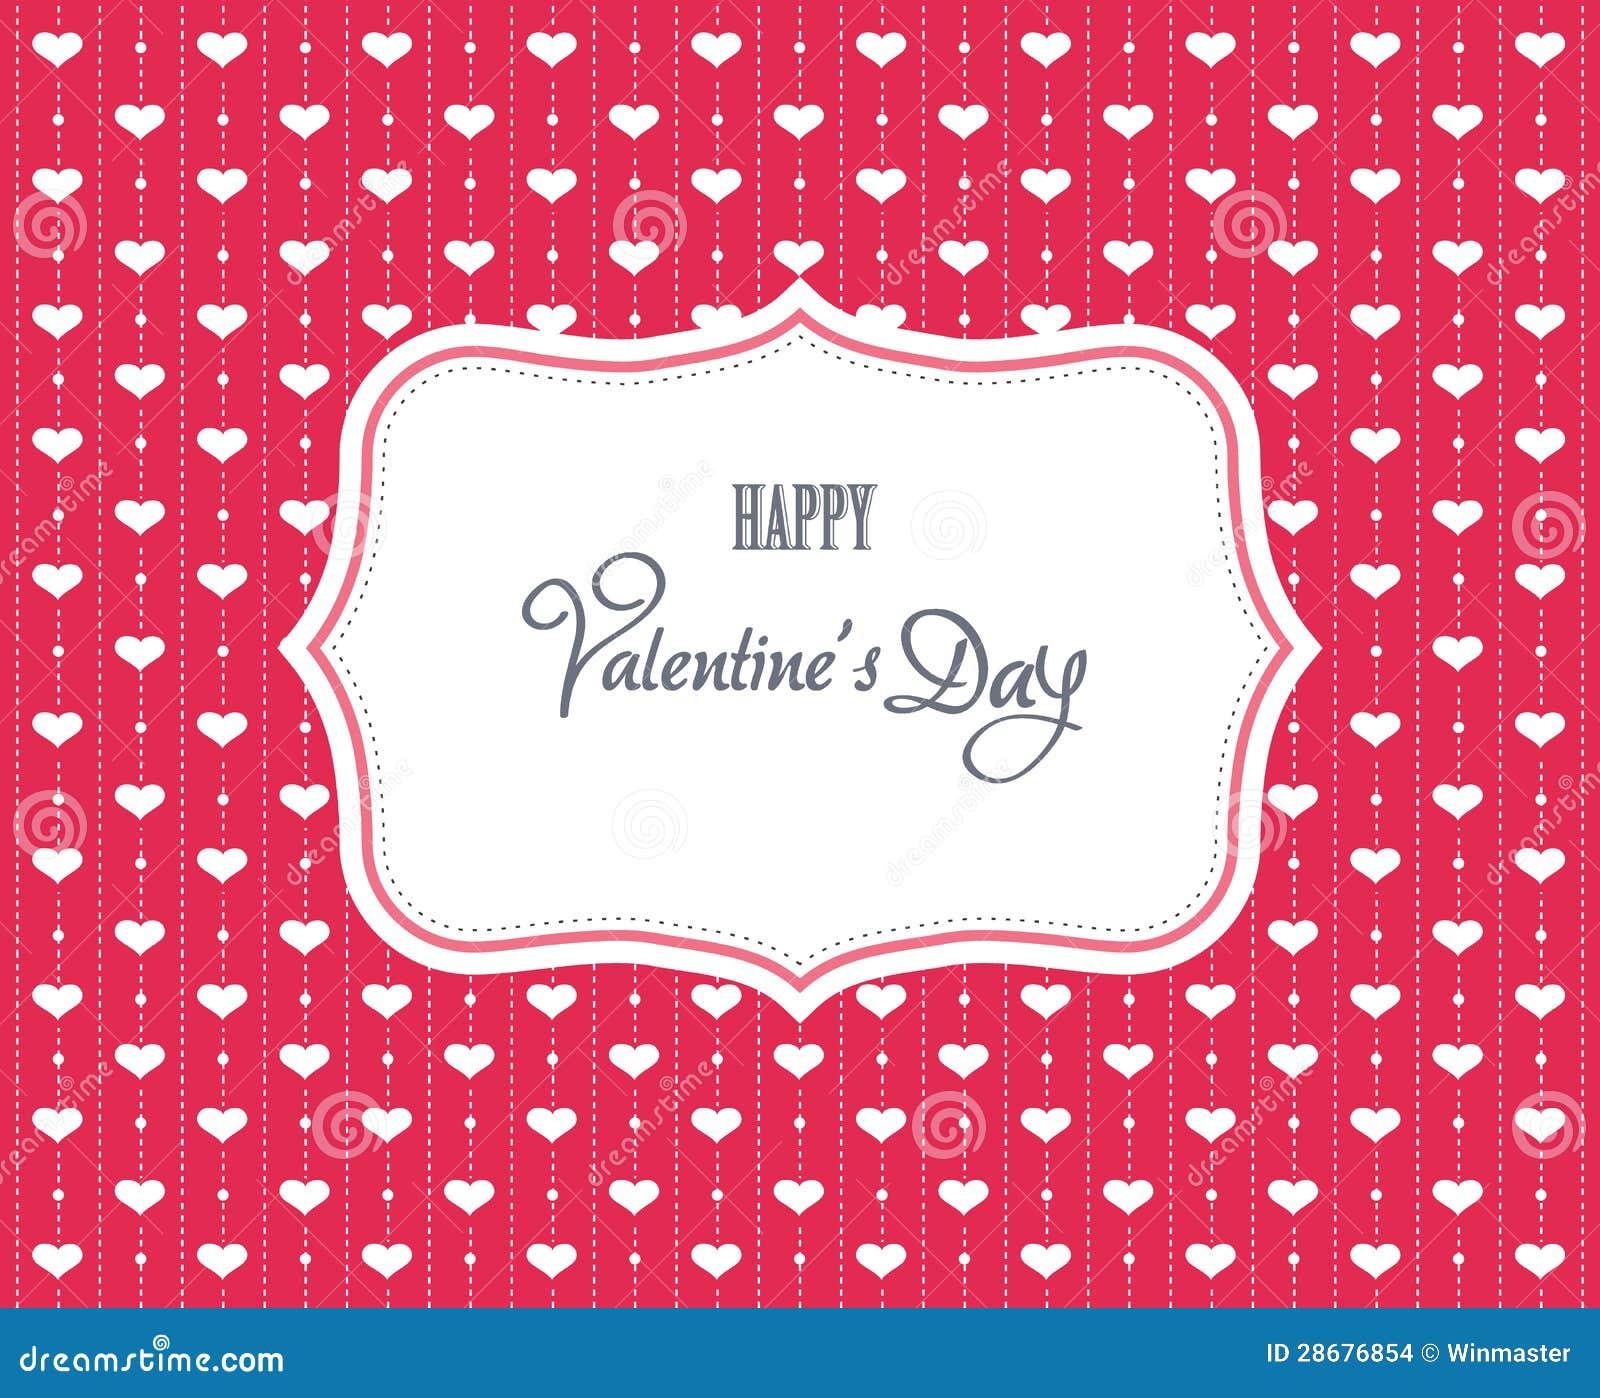 Sweet Valentine Card Images Image 28676854 – Sweet Valentine Card